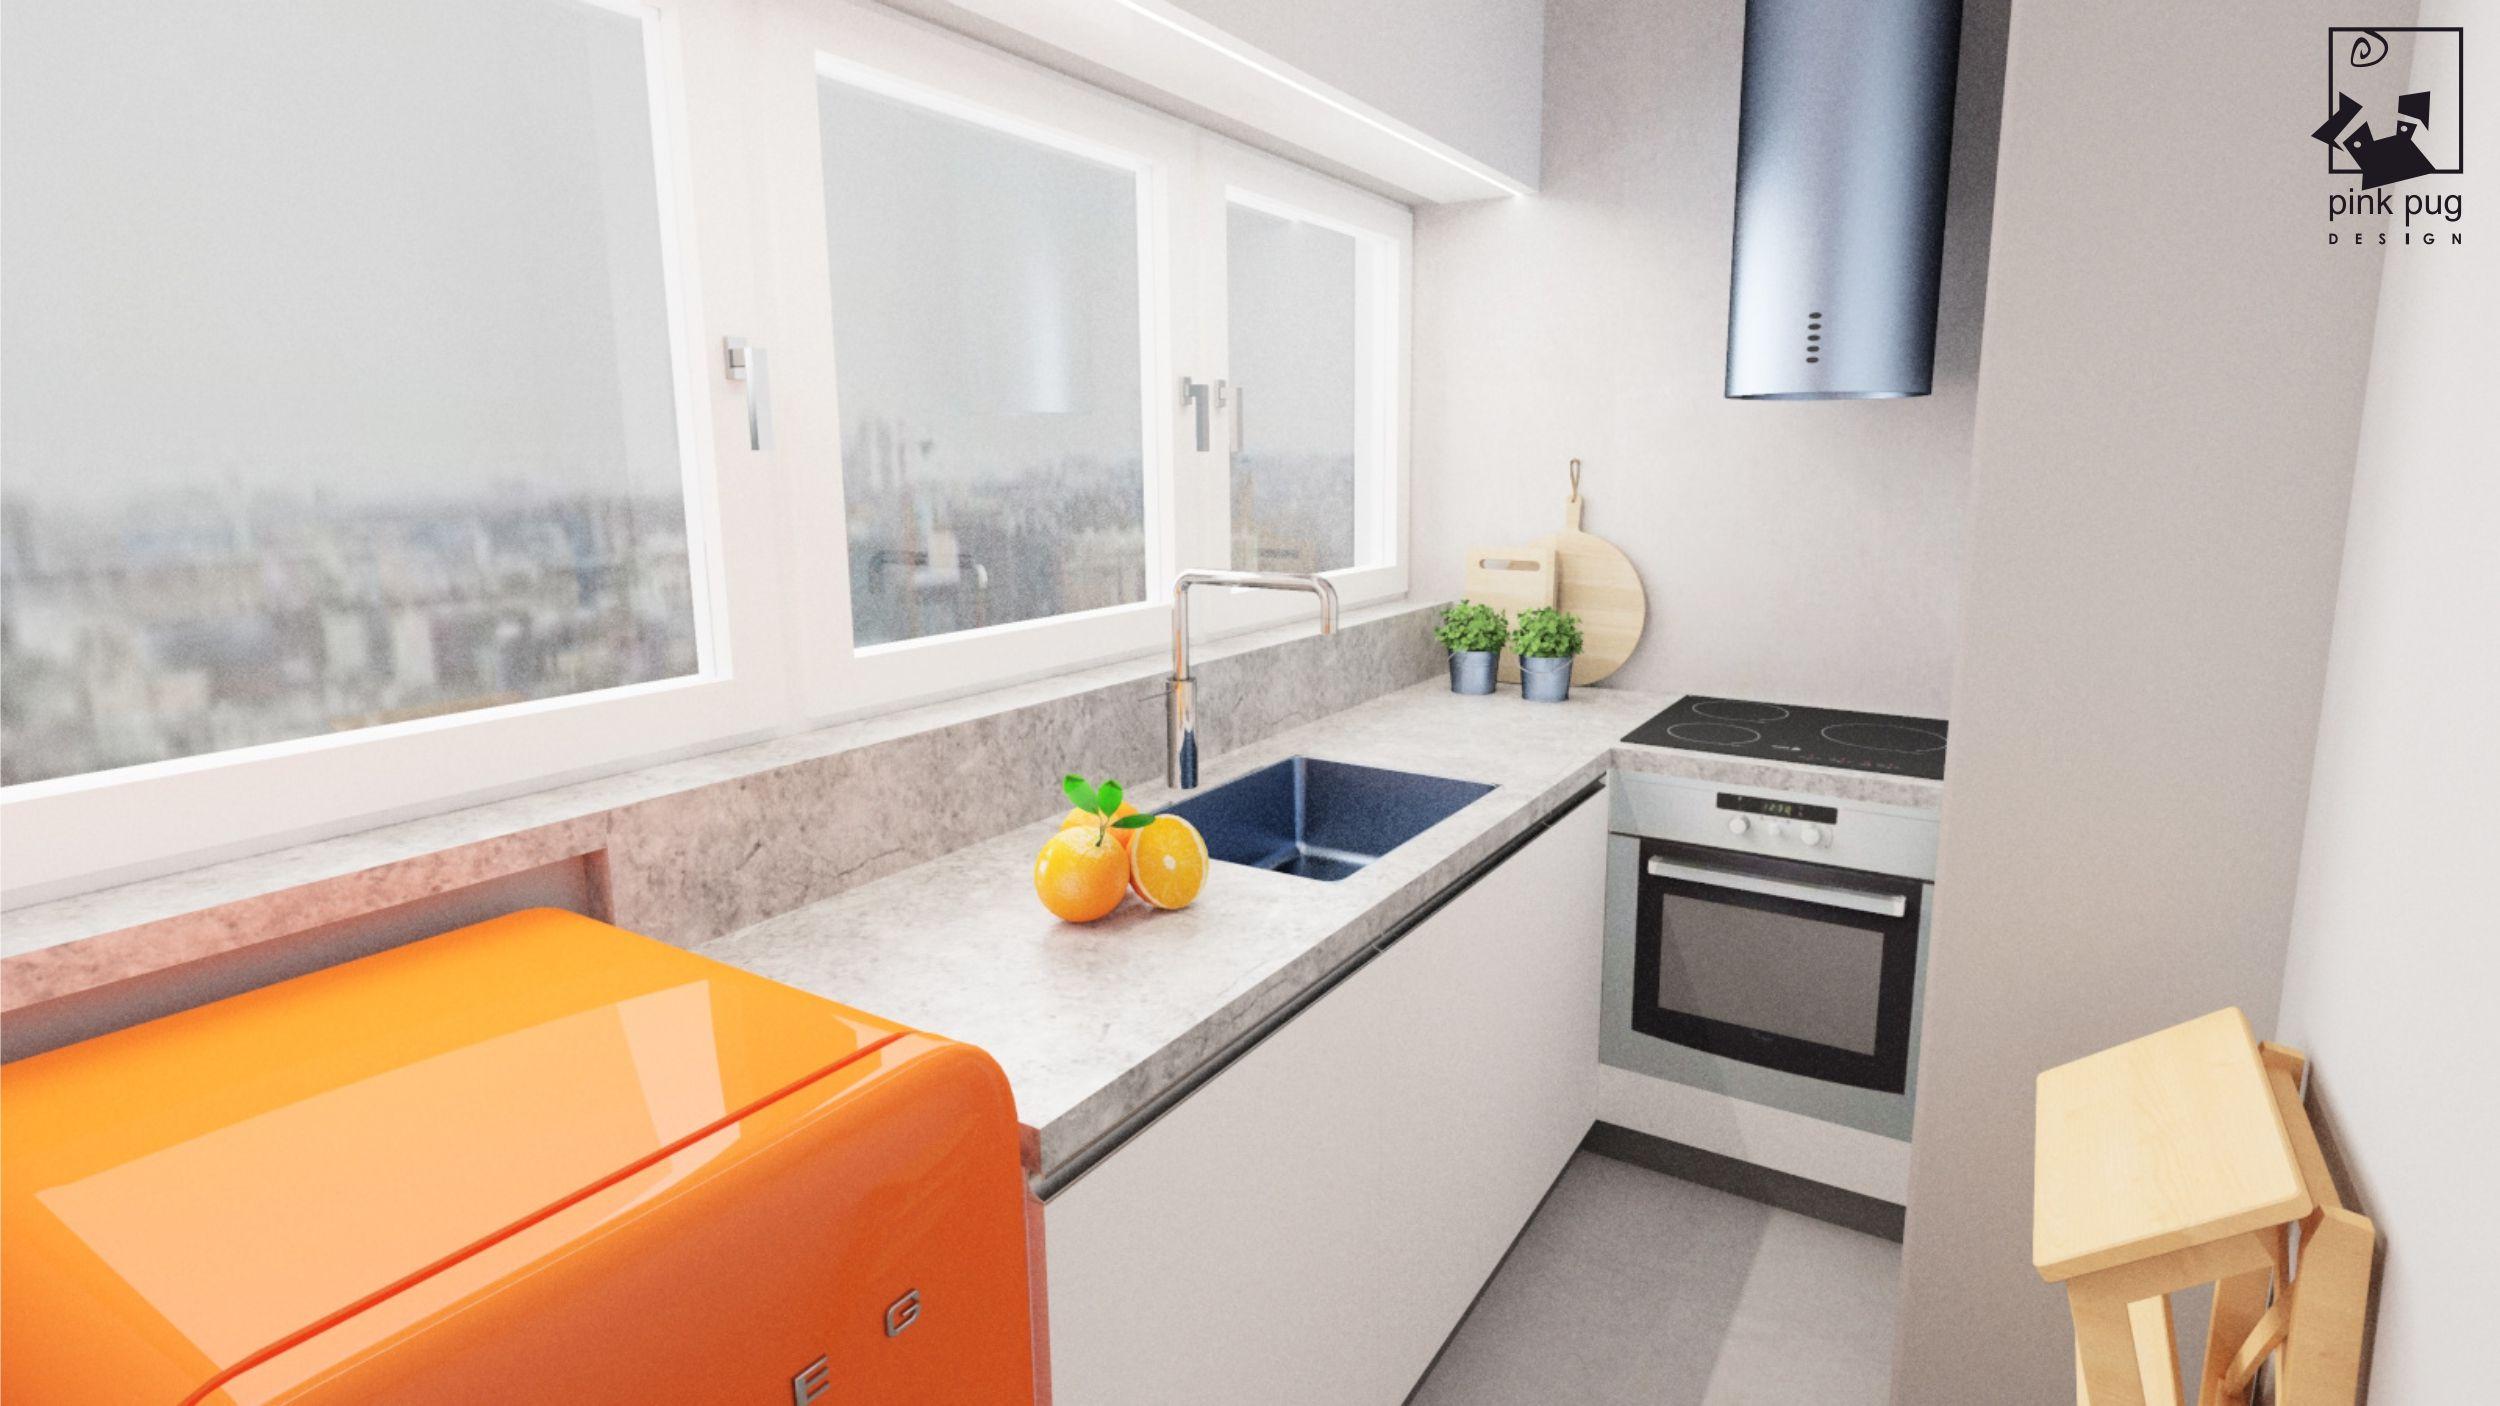 Zdjecie Mala Kuchnia W Bialo Szarym Kolorze Interior Design Kitchen Kitchen Design Small Kitchen Design